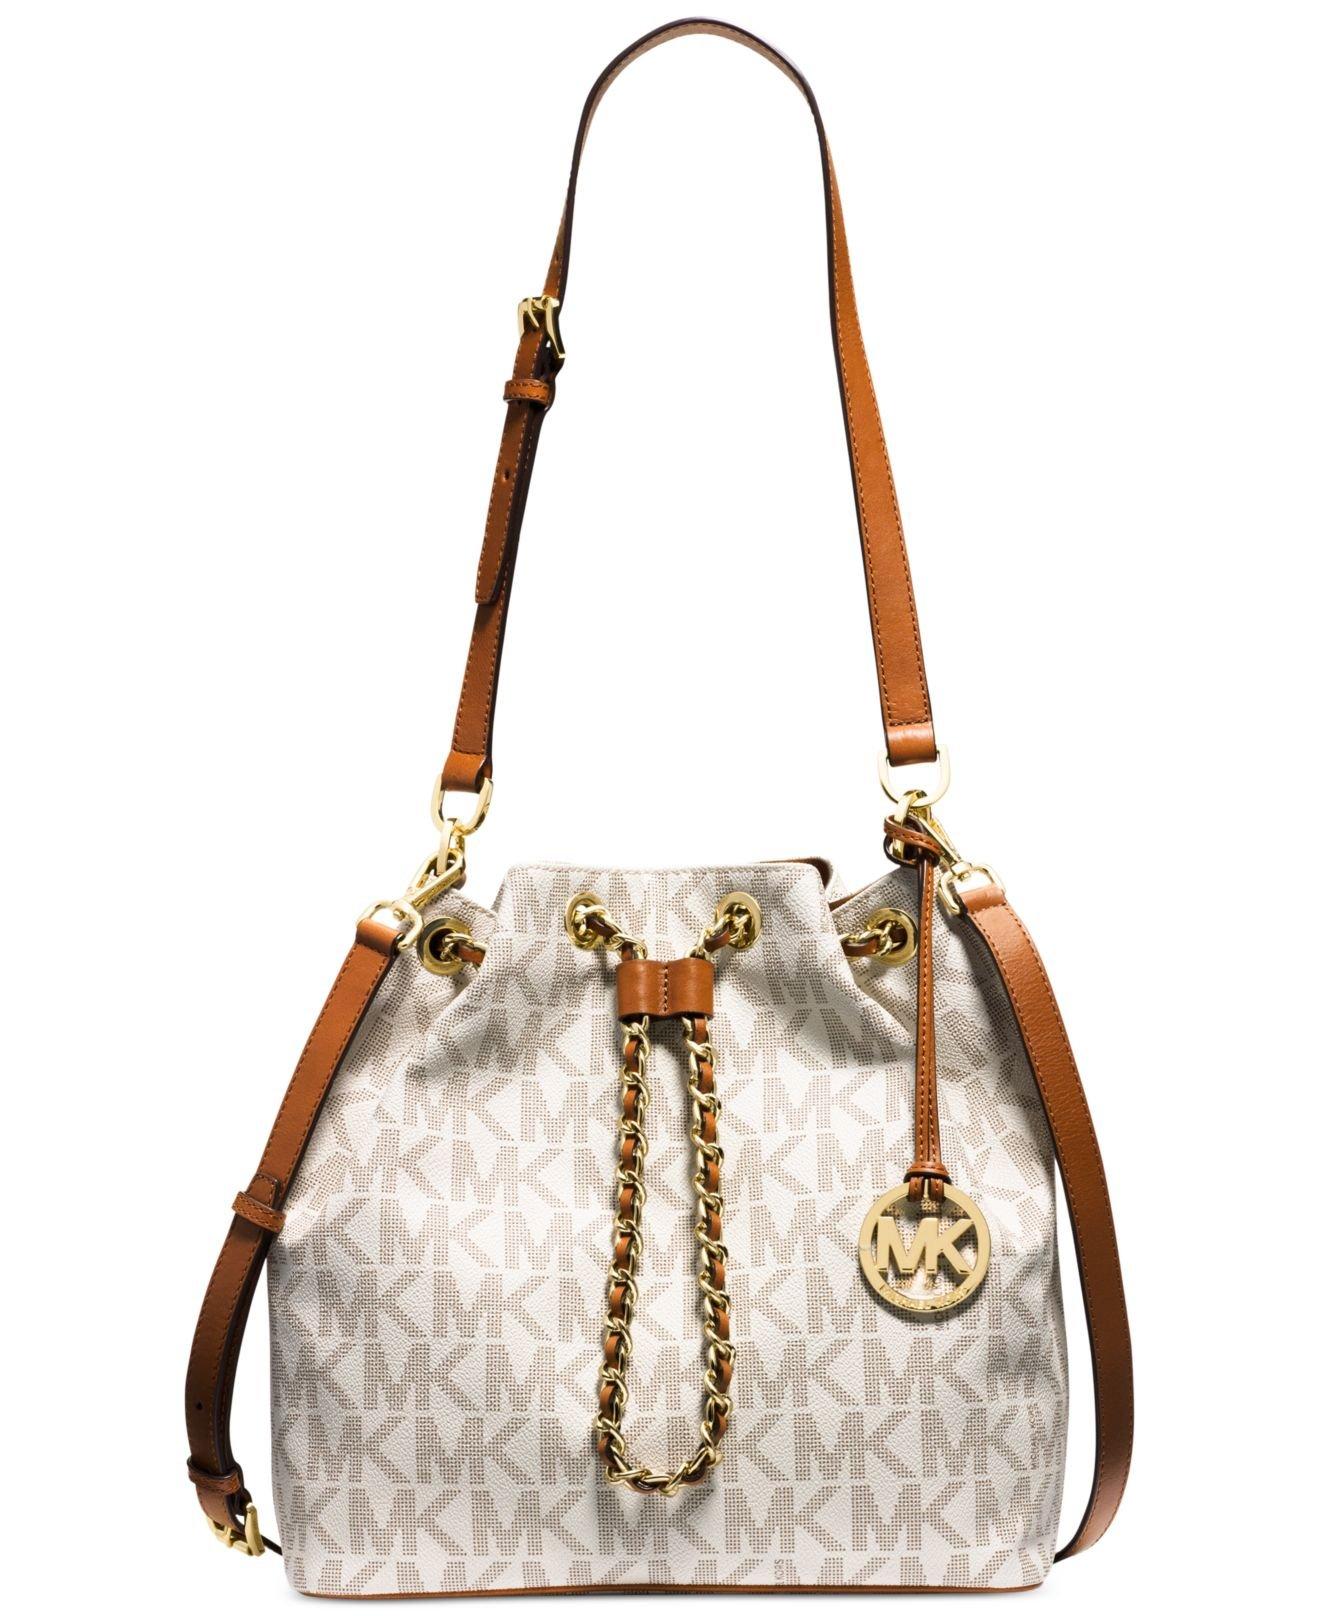 8ea99eedb8cd53 ireland michael kors chain drawstring bag price f0ece 682a0